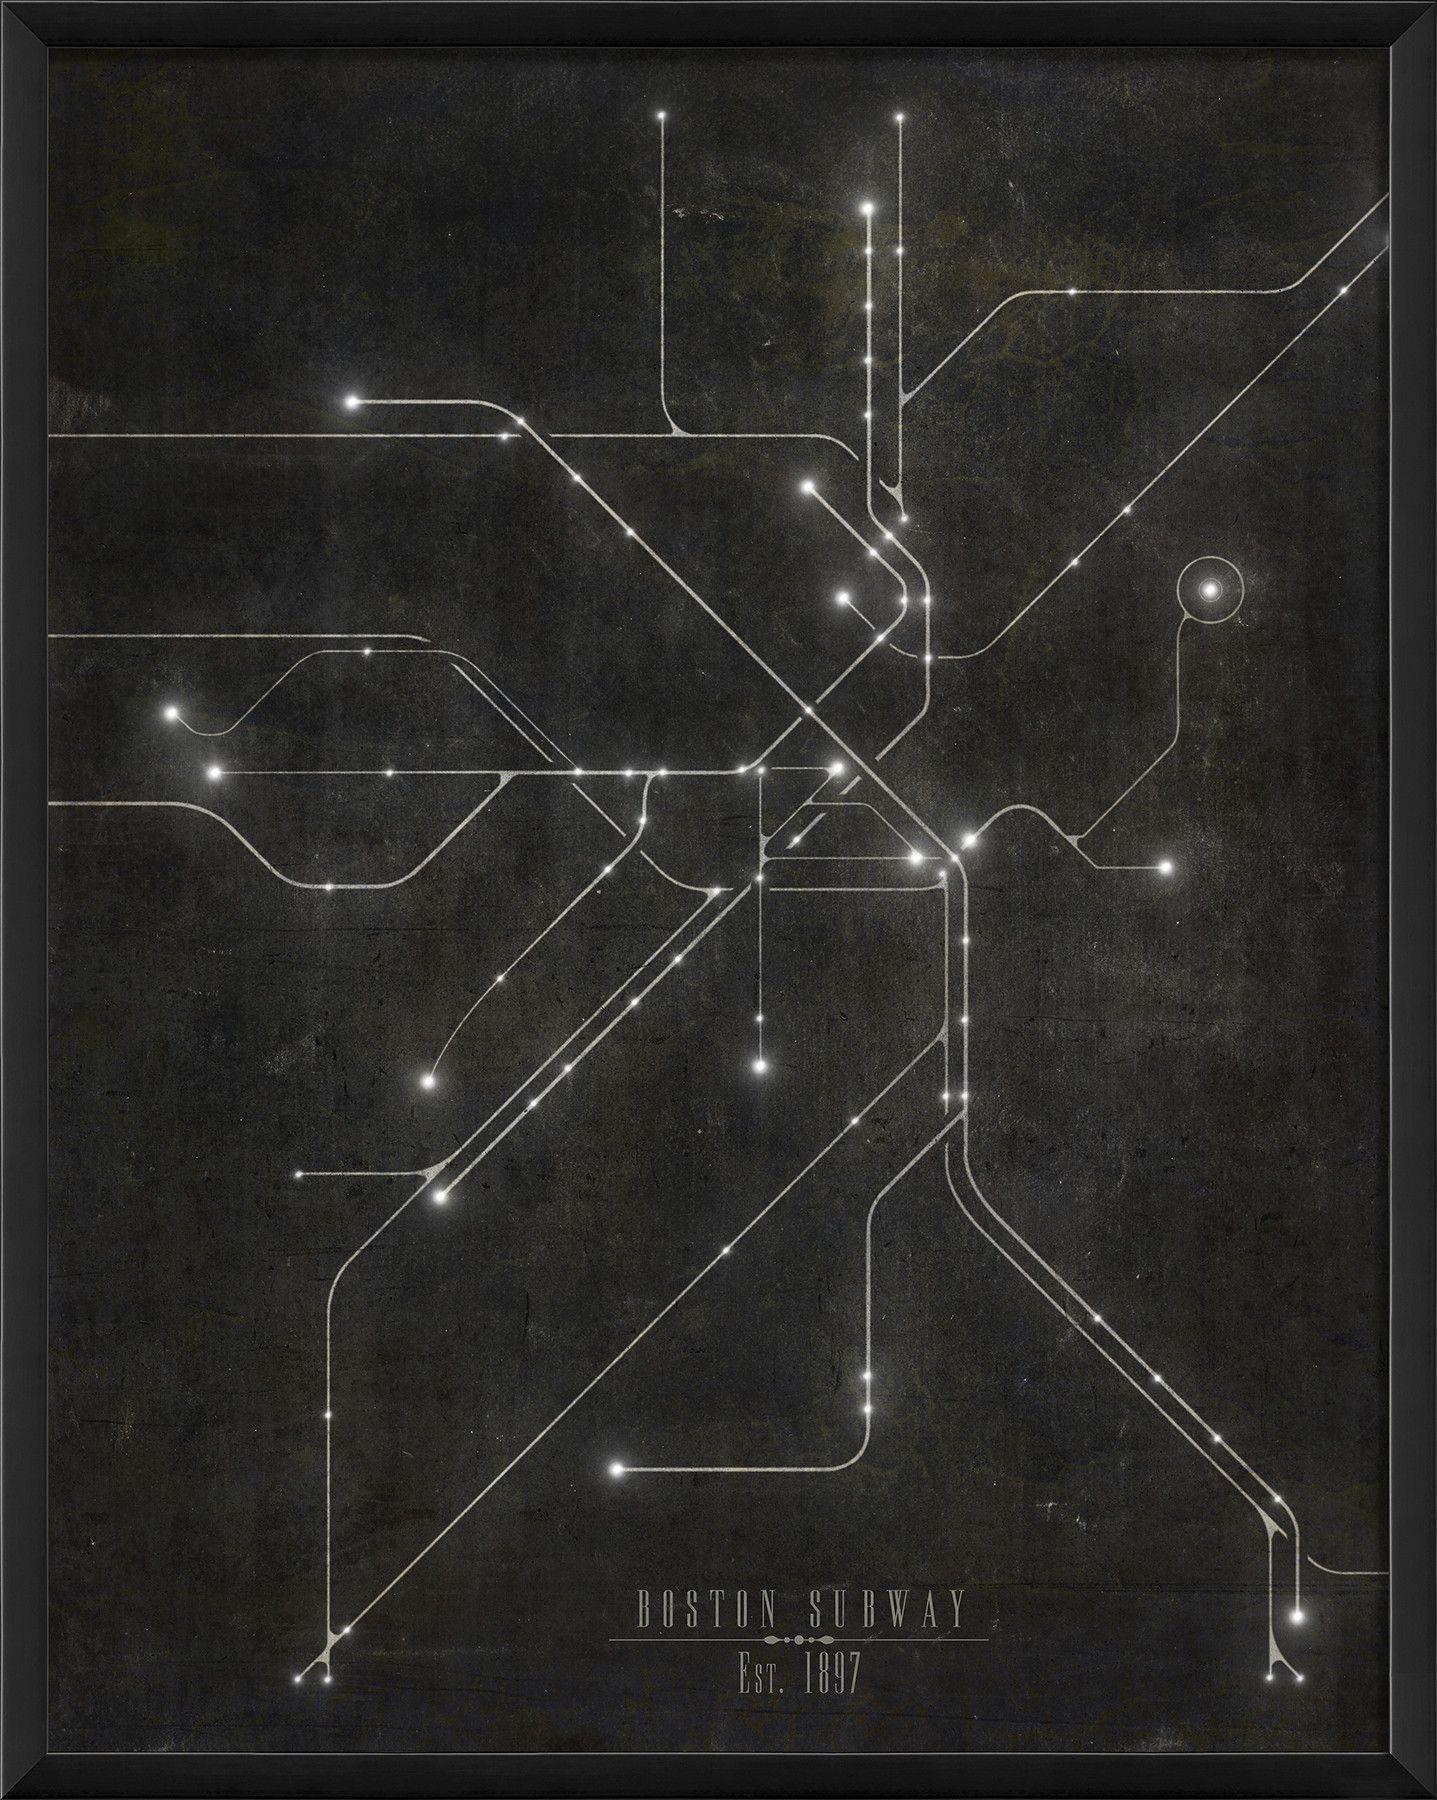 Subway Map Art Boston.Boston Subway Map Framed Graphic Art What The Hell Subway Map